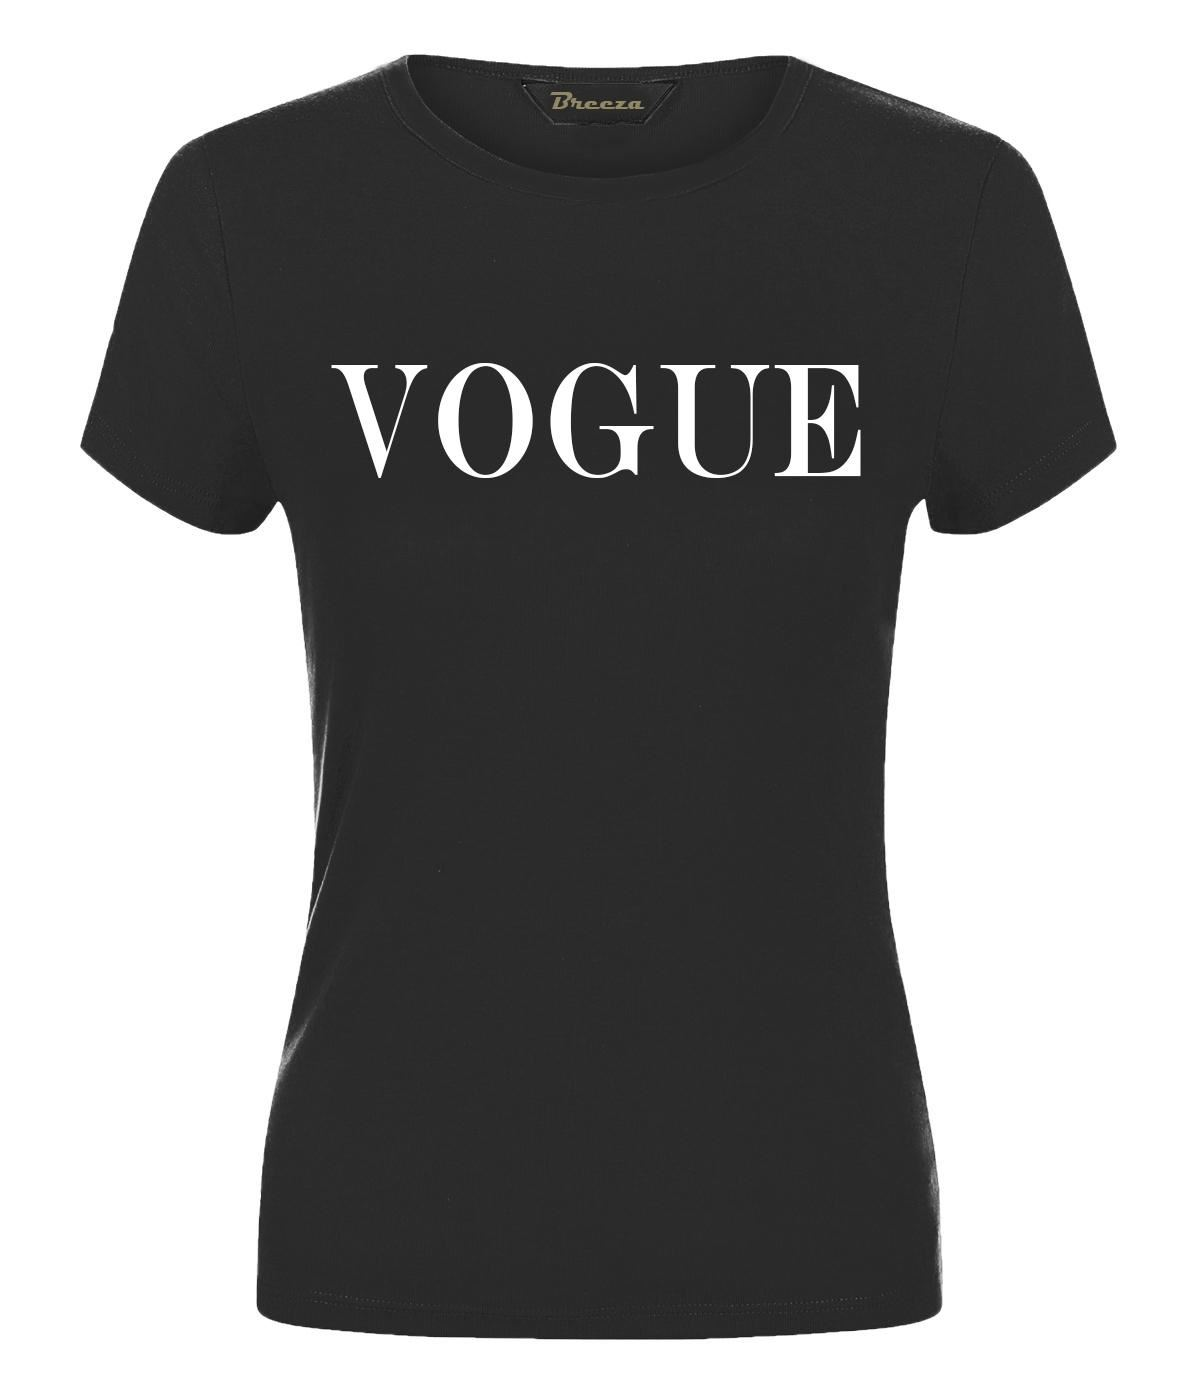 Women Ladies Celebrity Inspired VOGUE Slogan Short Sleeves T Shirt Fashion Top